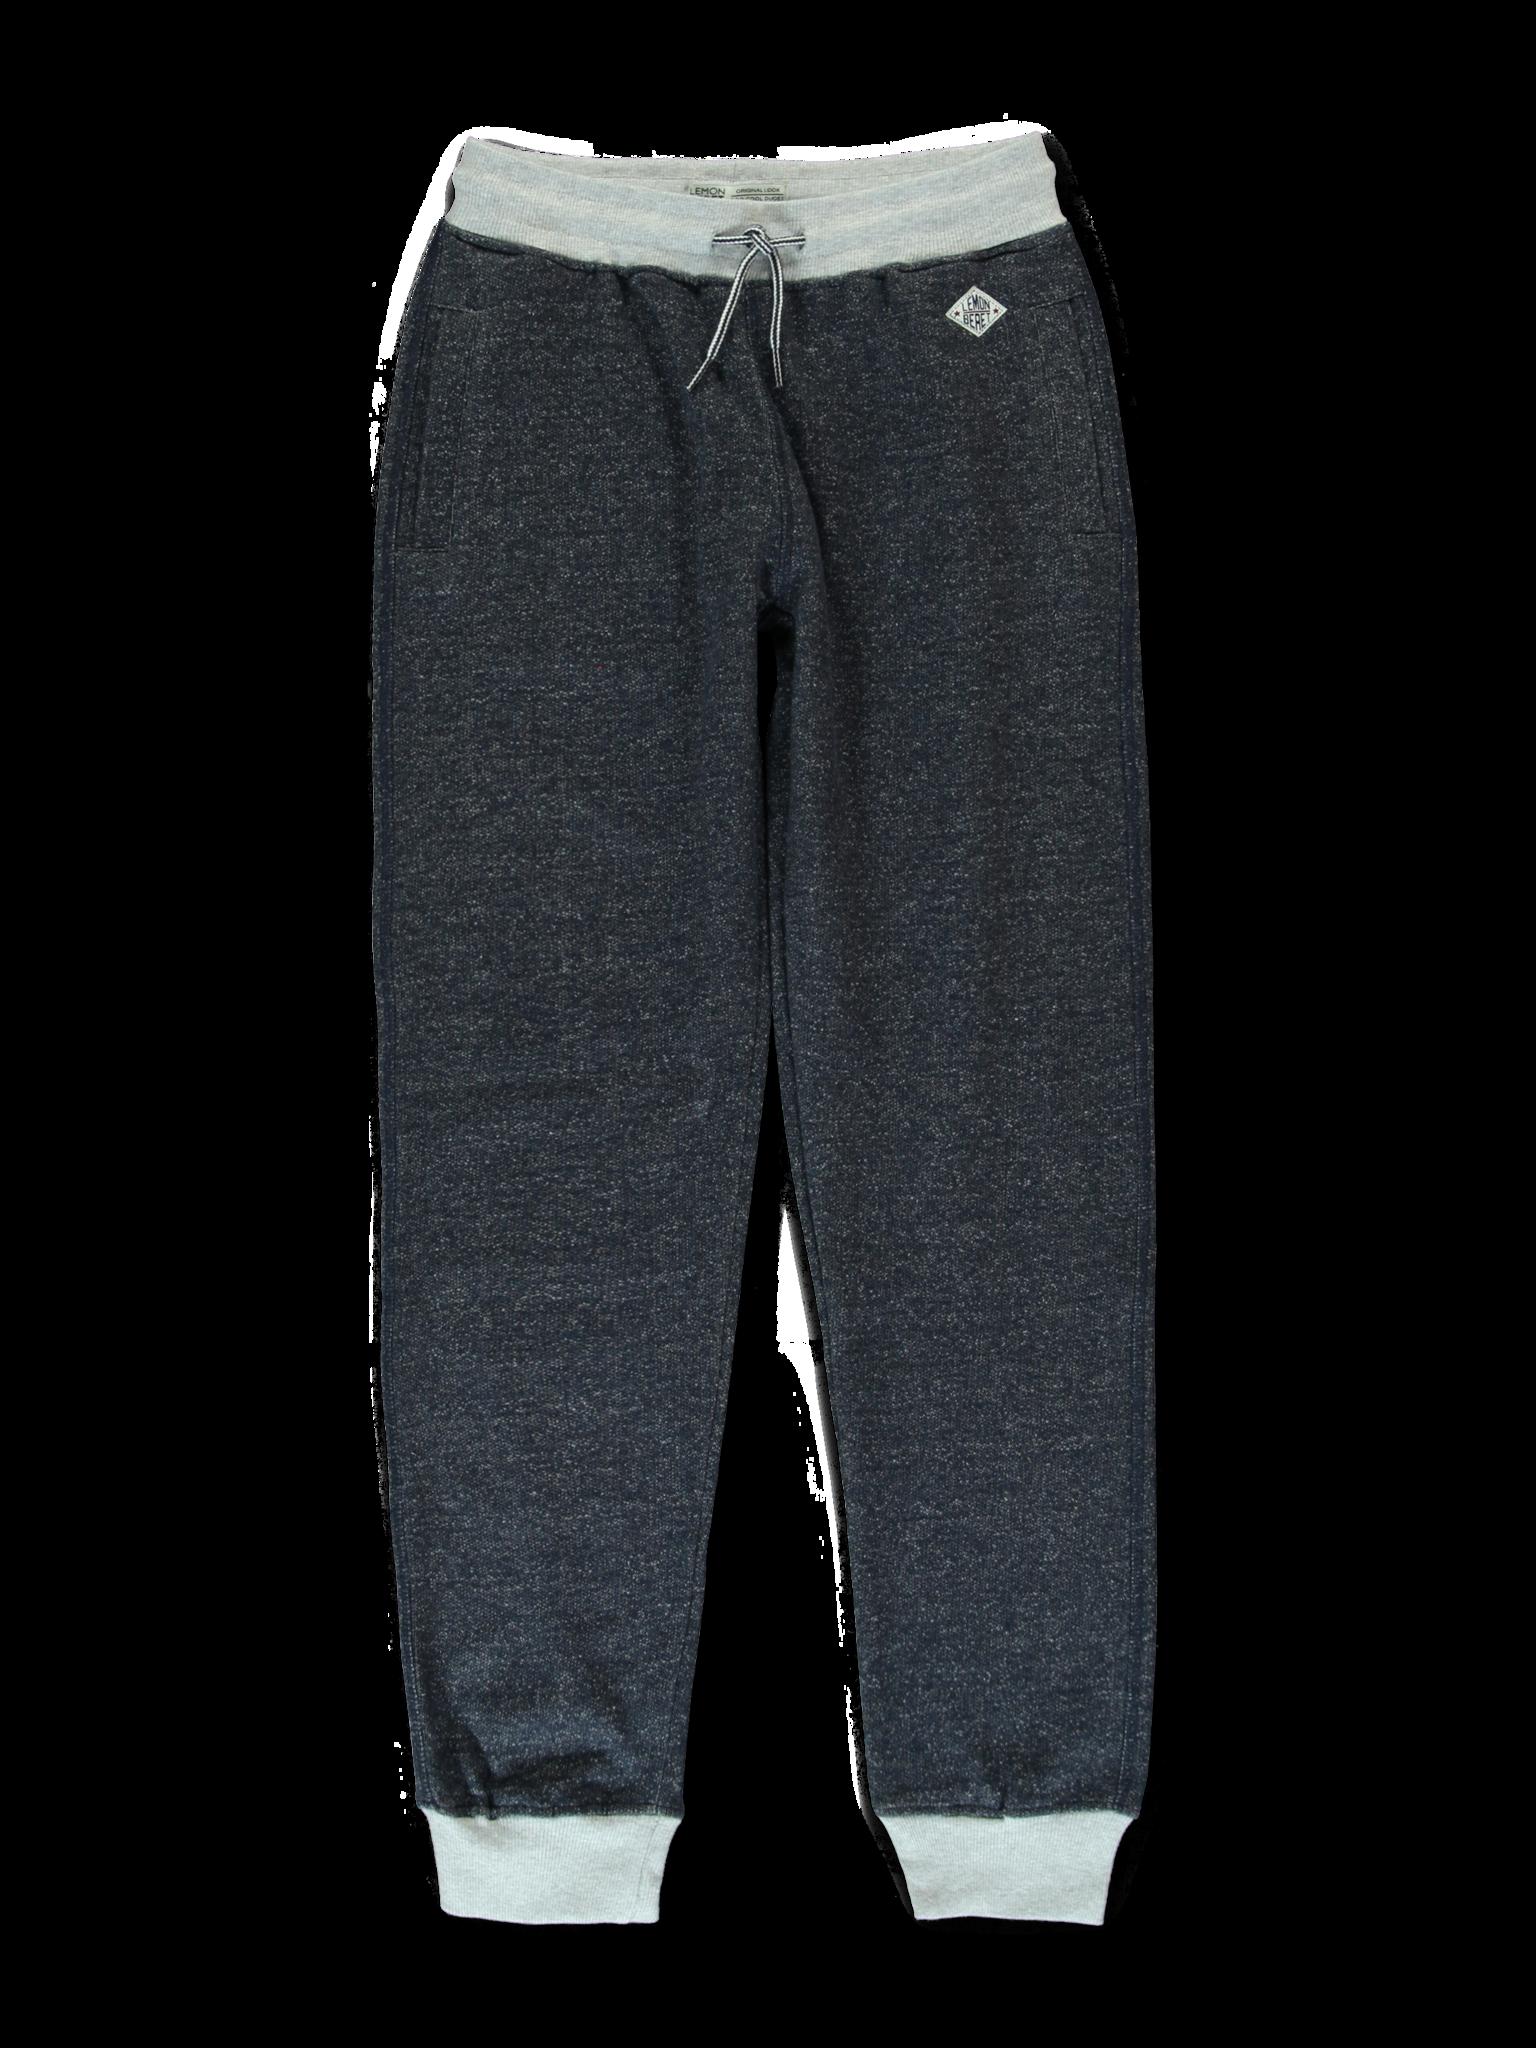 All Brands | Winterproducts Teen Boys | Jogging Pant | 12 pcs/box